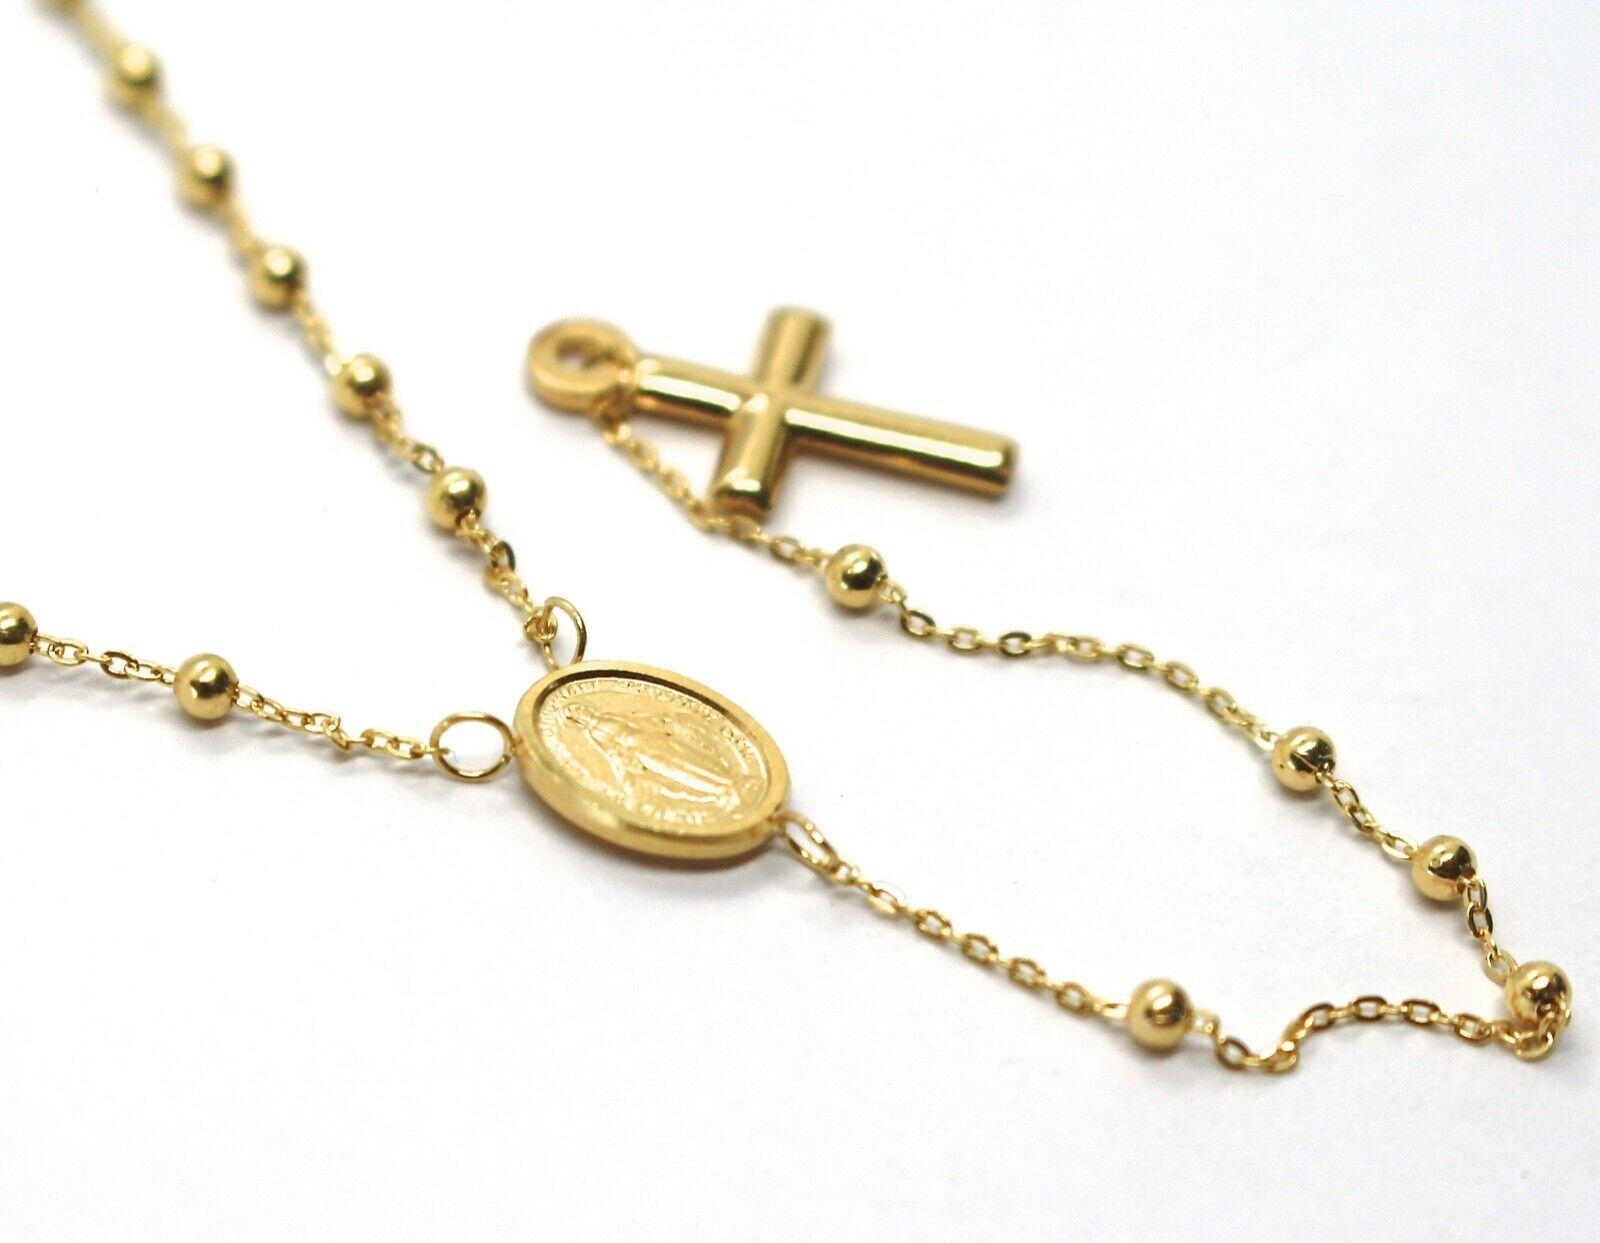 Mini Collar Rosario Oro Amarillo 750 18K, Medalla Milagrosa, Cruz, 48 CM image 3